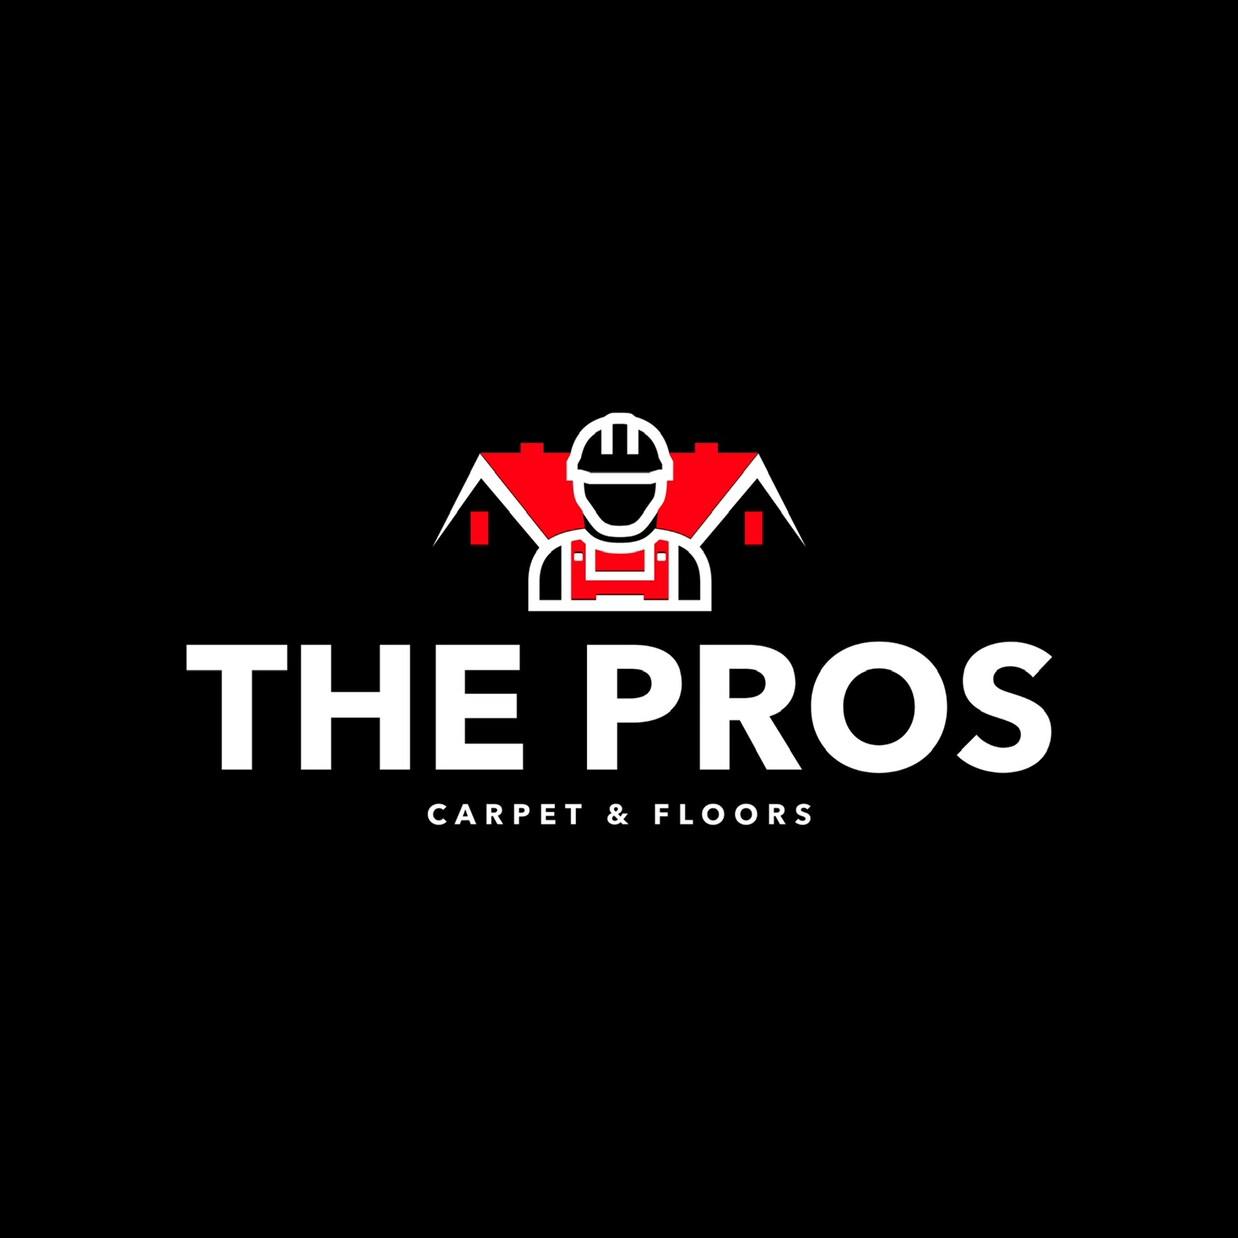 The Pros Carpet & Floors of Greensboro